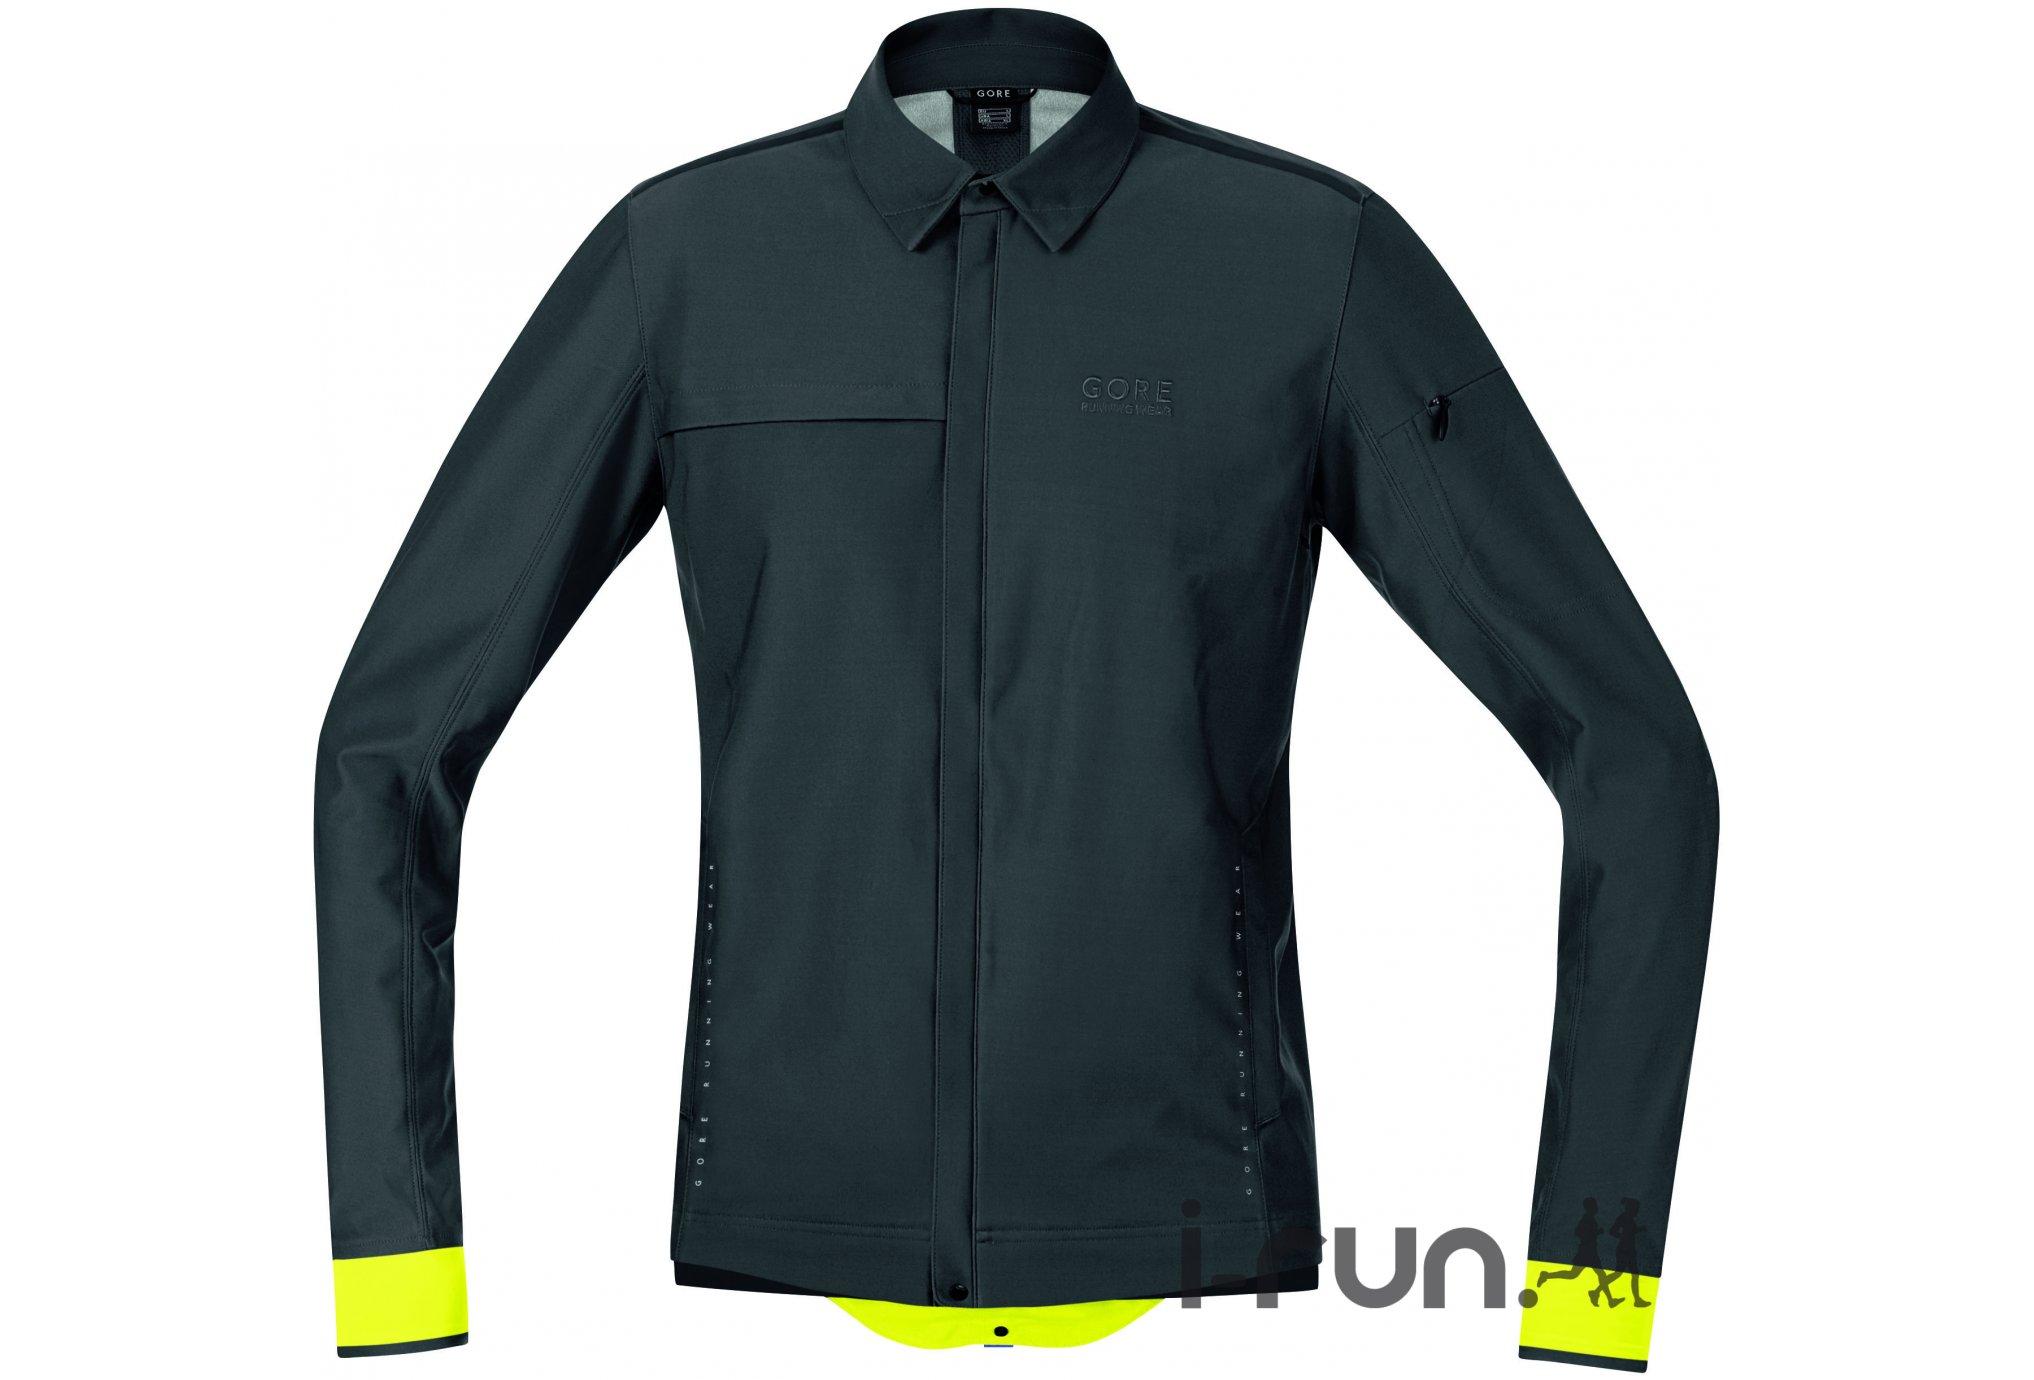 Gore Running Wear Veste Urban Run Windstopper Soft Shell M Diététique Vêtements homme